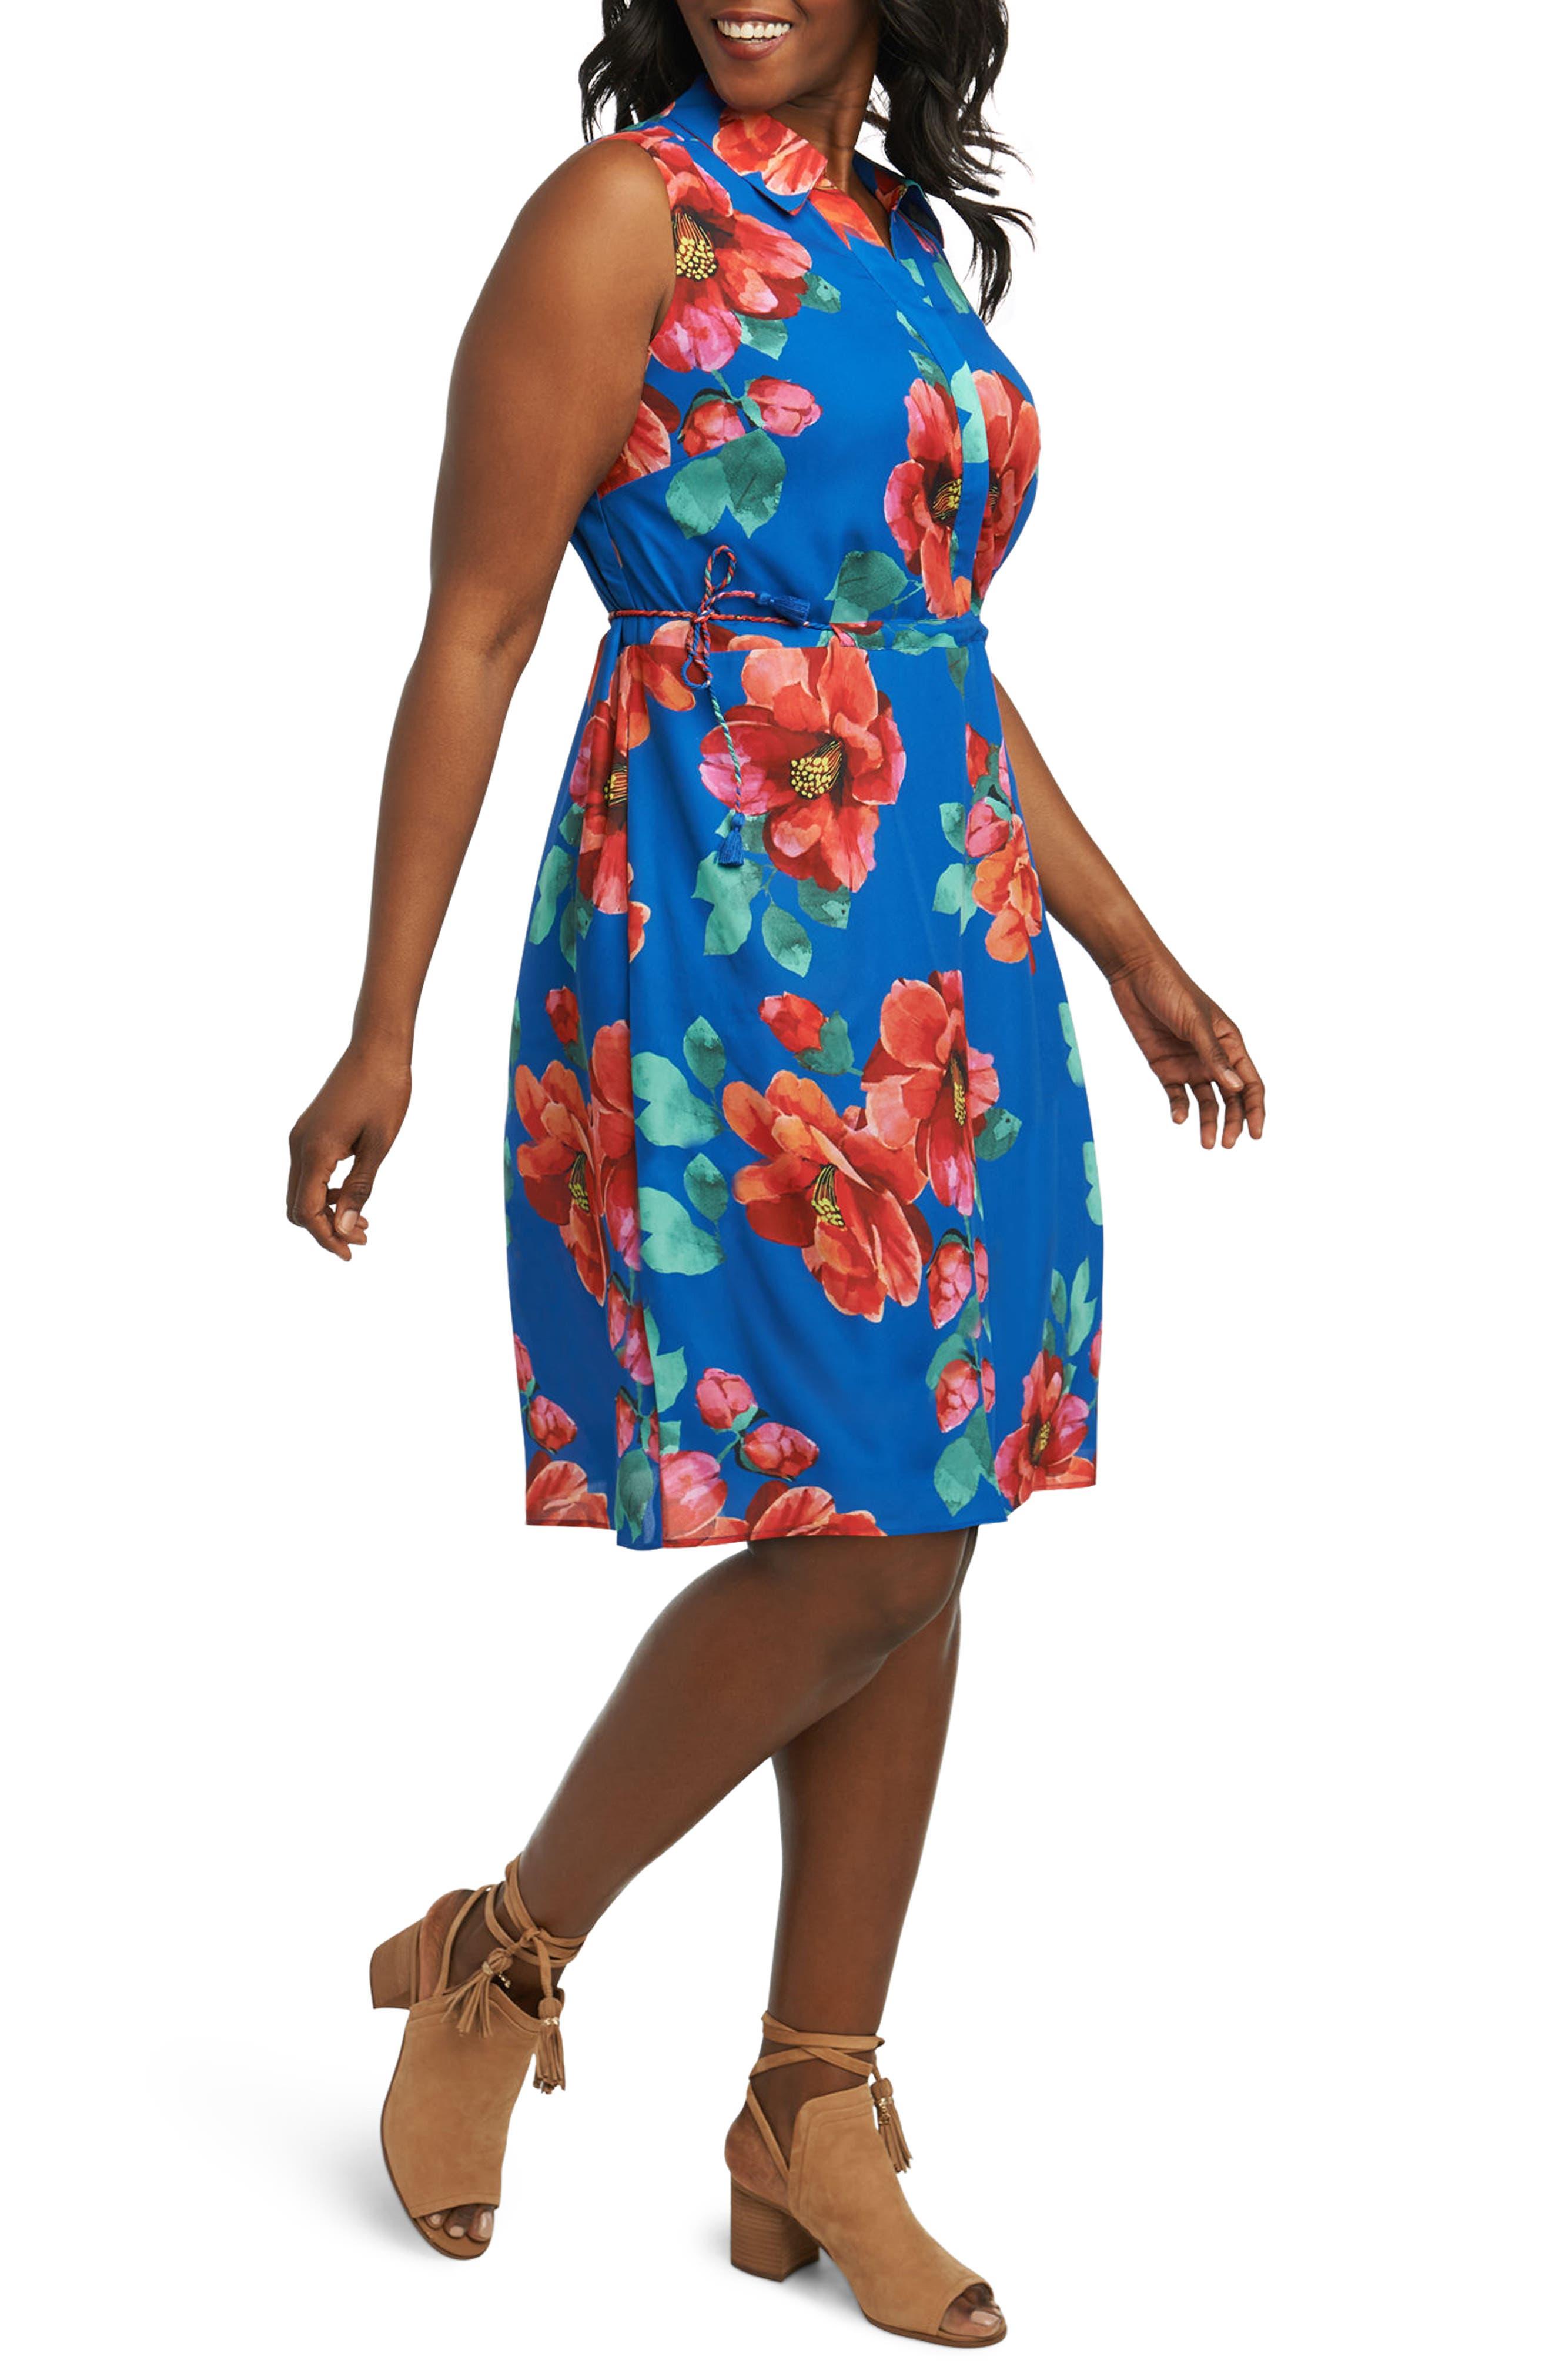 Adessia Hibiscus Floral Tassel Tie Dress,                             Alternate thumbnail 3, color,                             MULTI